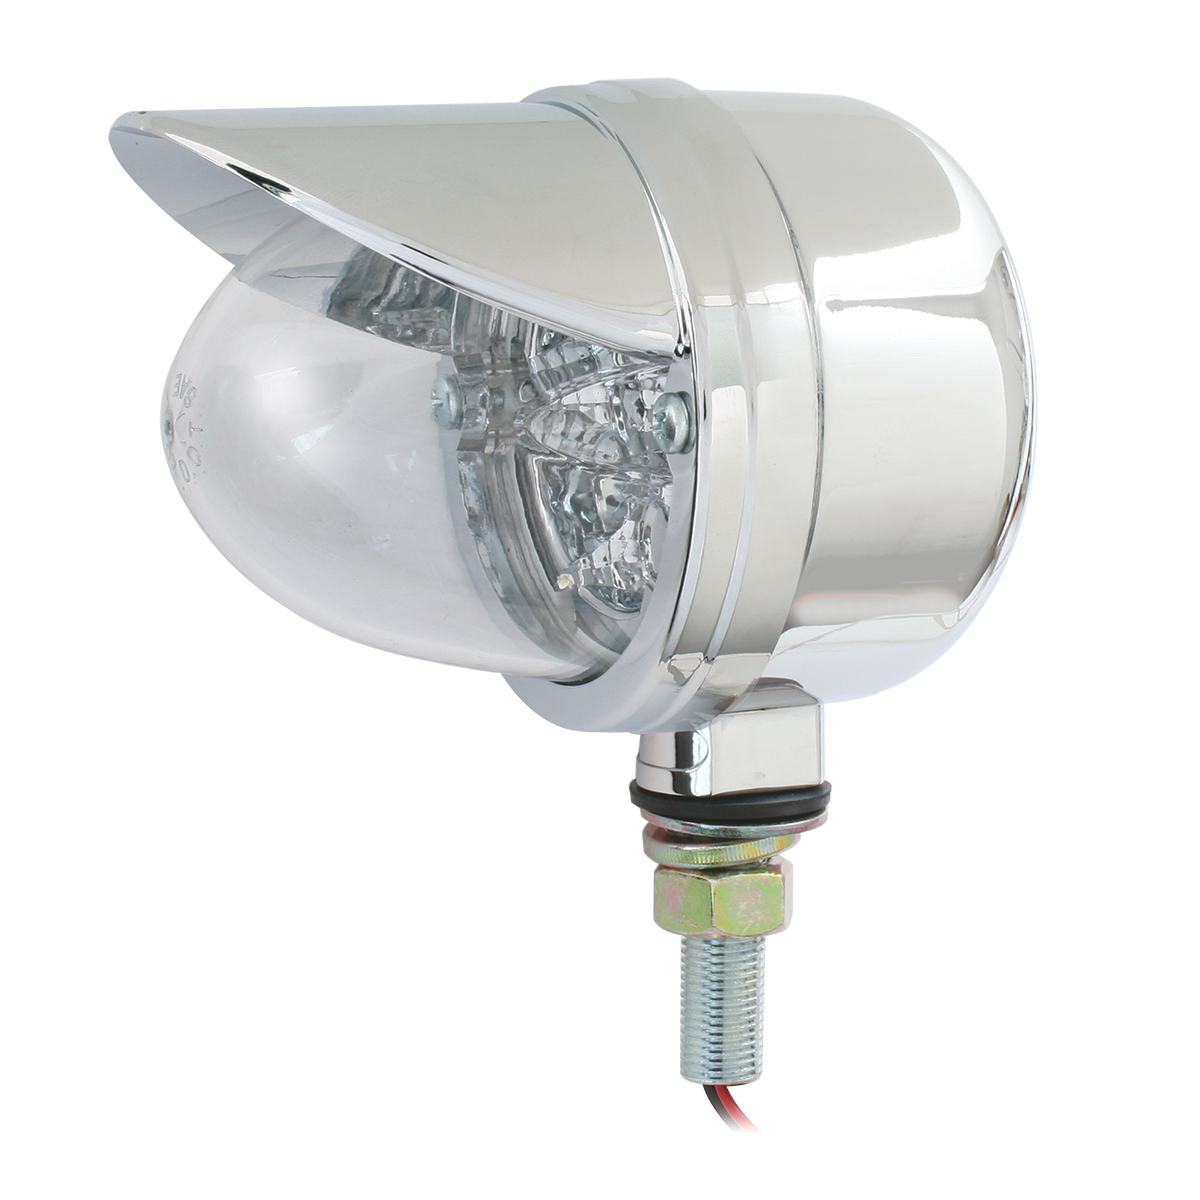 Single Face Spyder LED Pedestal Light in Clear Lens